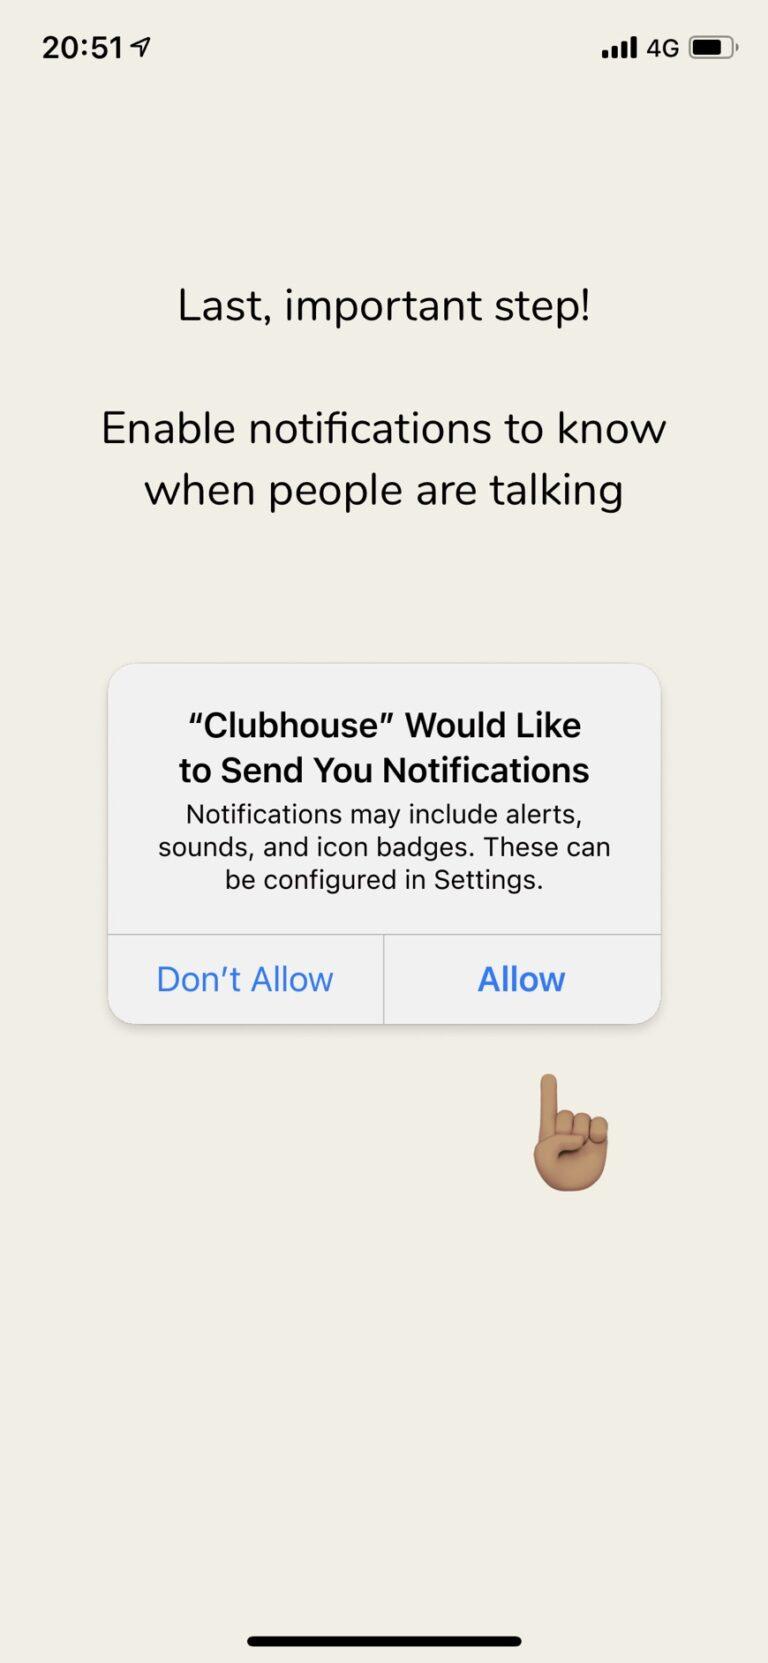 Clubhouse 始め 方 【図解】Clubhouse(クラブハウス)登録/始め方と使い方のコツ【招待...